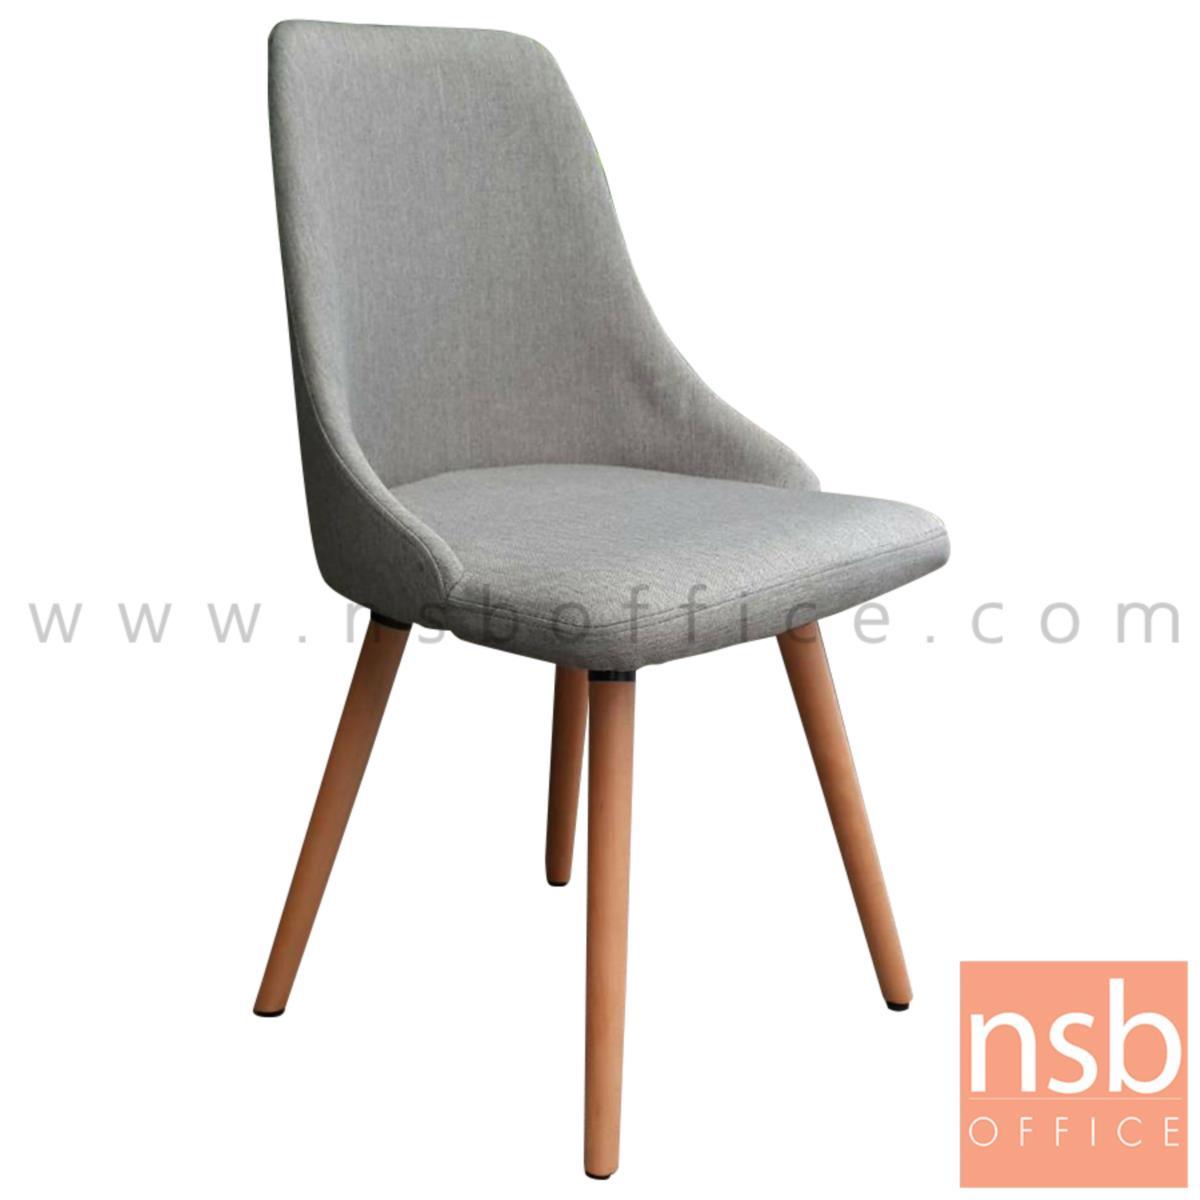 B29A291:เก้าอี้โมเดิร์นหุ้มผ้า รุ่น Perlette (เพอเลต) ขนาด 48W cm. โครงขาไม้